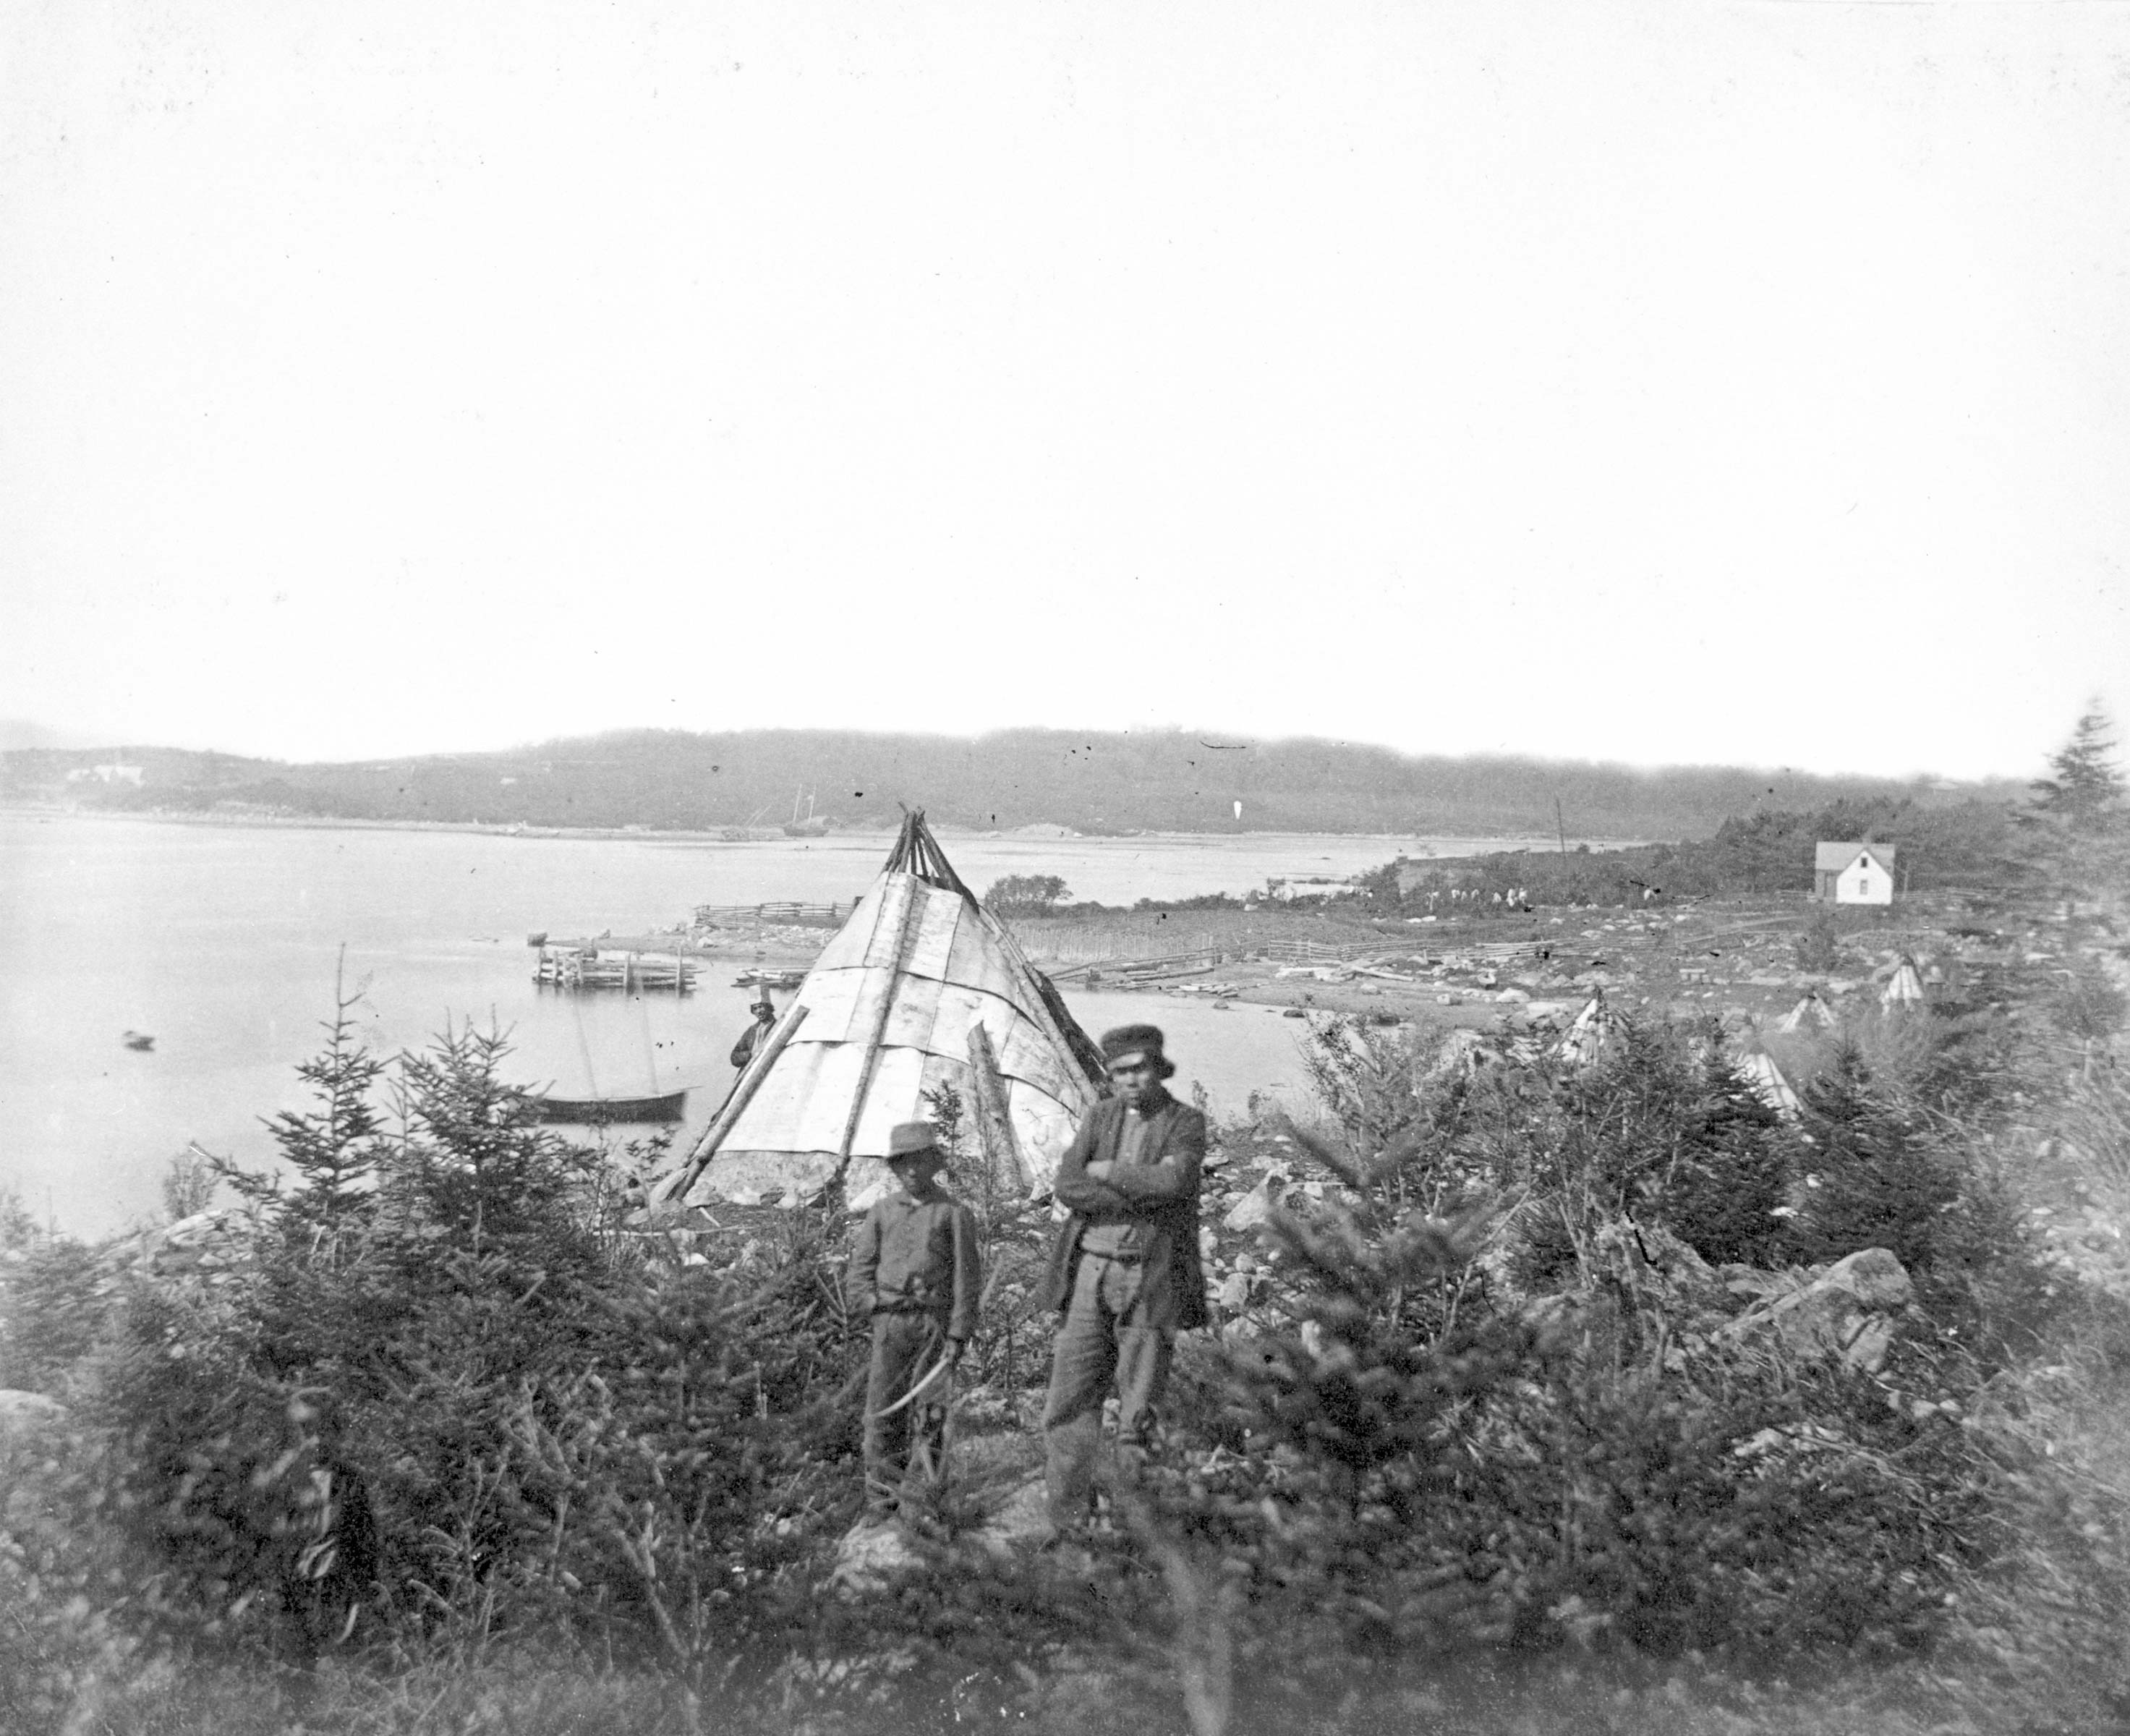 A Mi'kmaq father and child at Tuft's Cove settlement, Dartmouth, Nova Scotia, Canada, circa 1871.Nova Scotia Archives & Records Management NSARM accession no. 1992-412 Photographic Advertising Album, 1871, p. 18 / neg. no.: N-0418